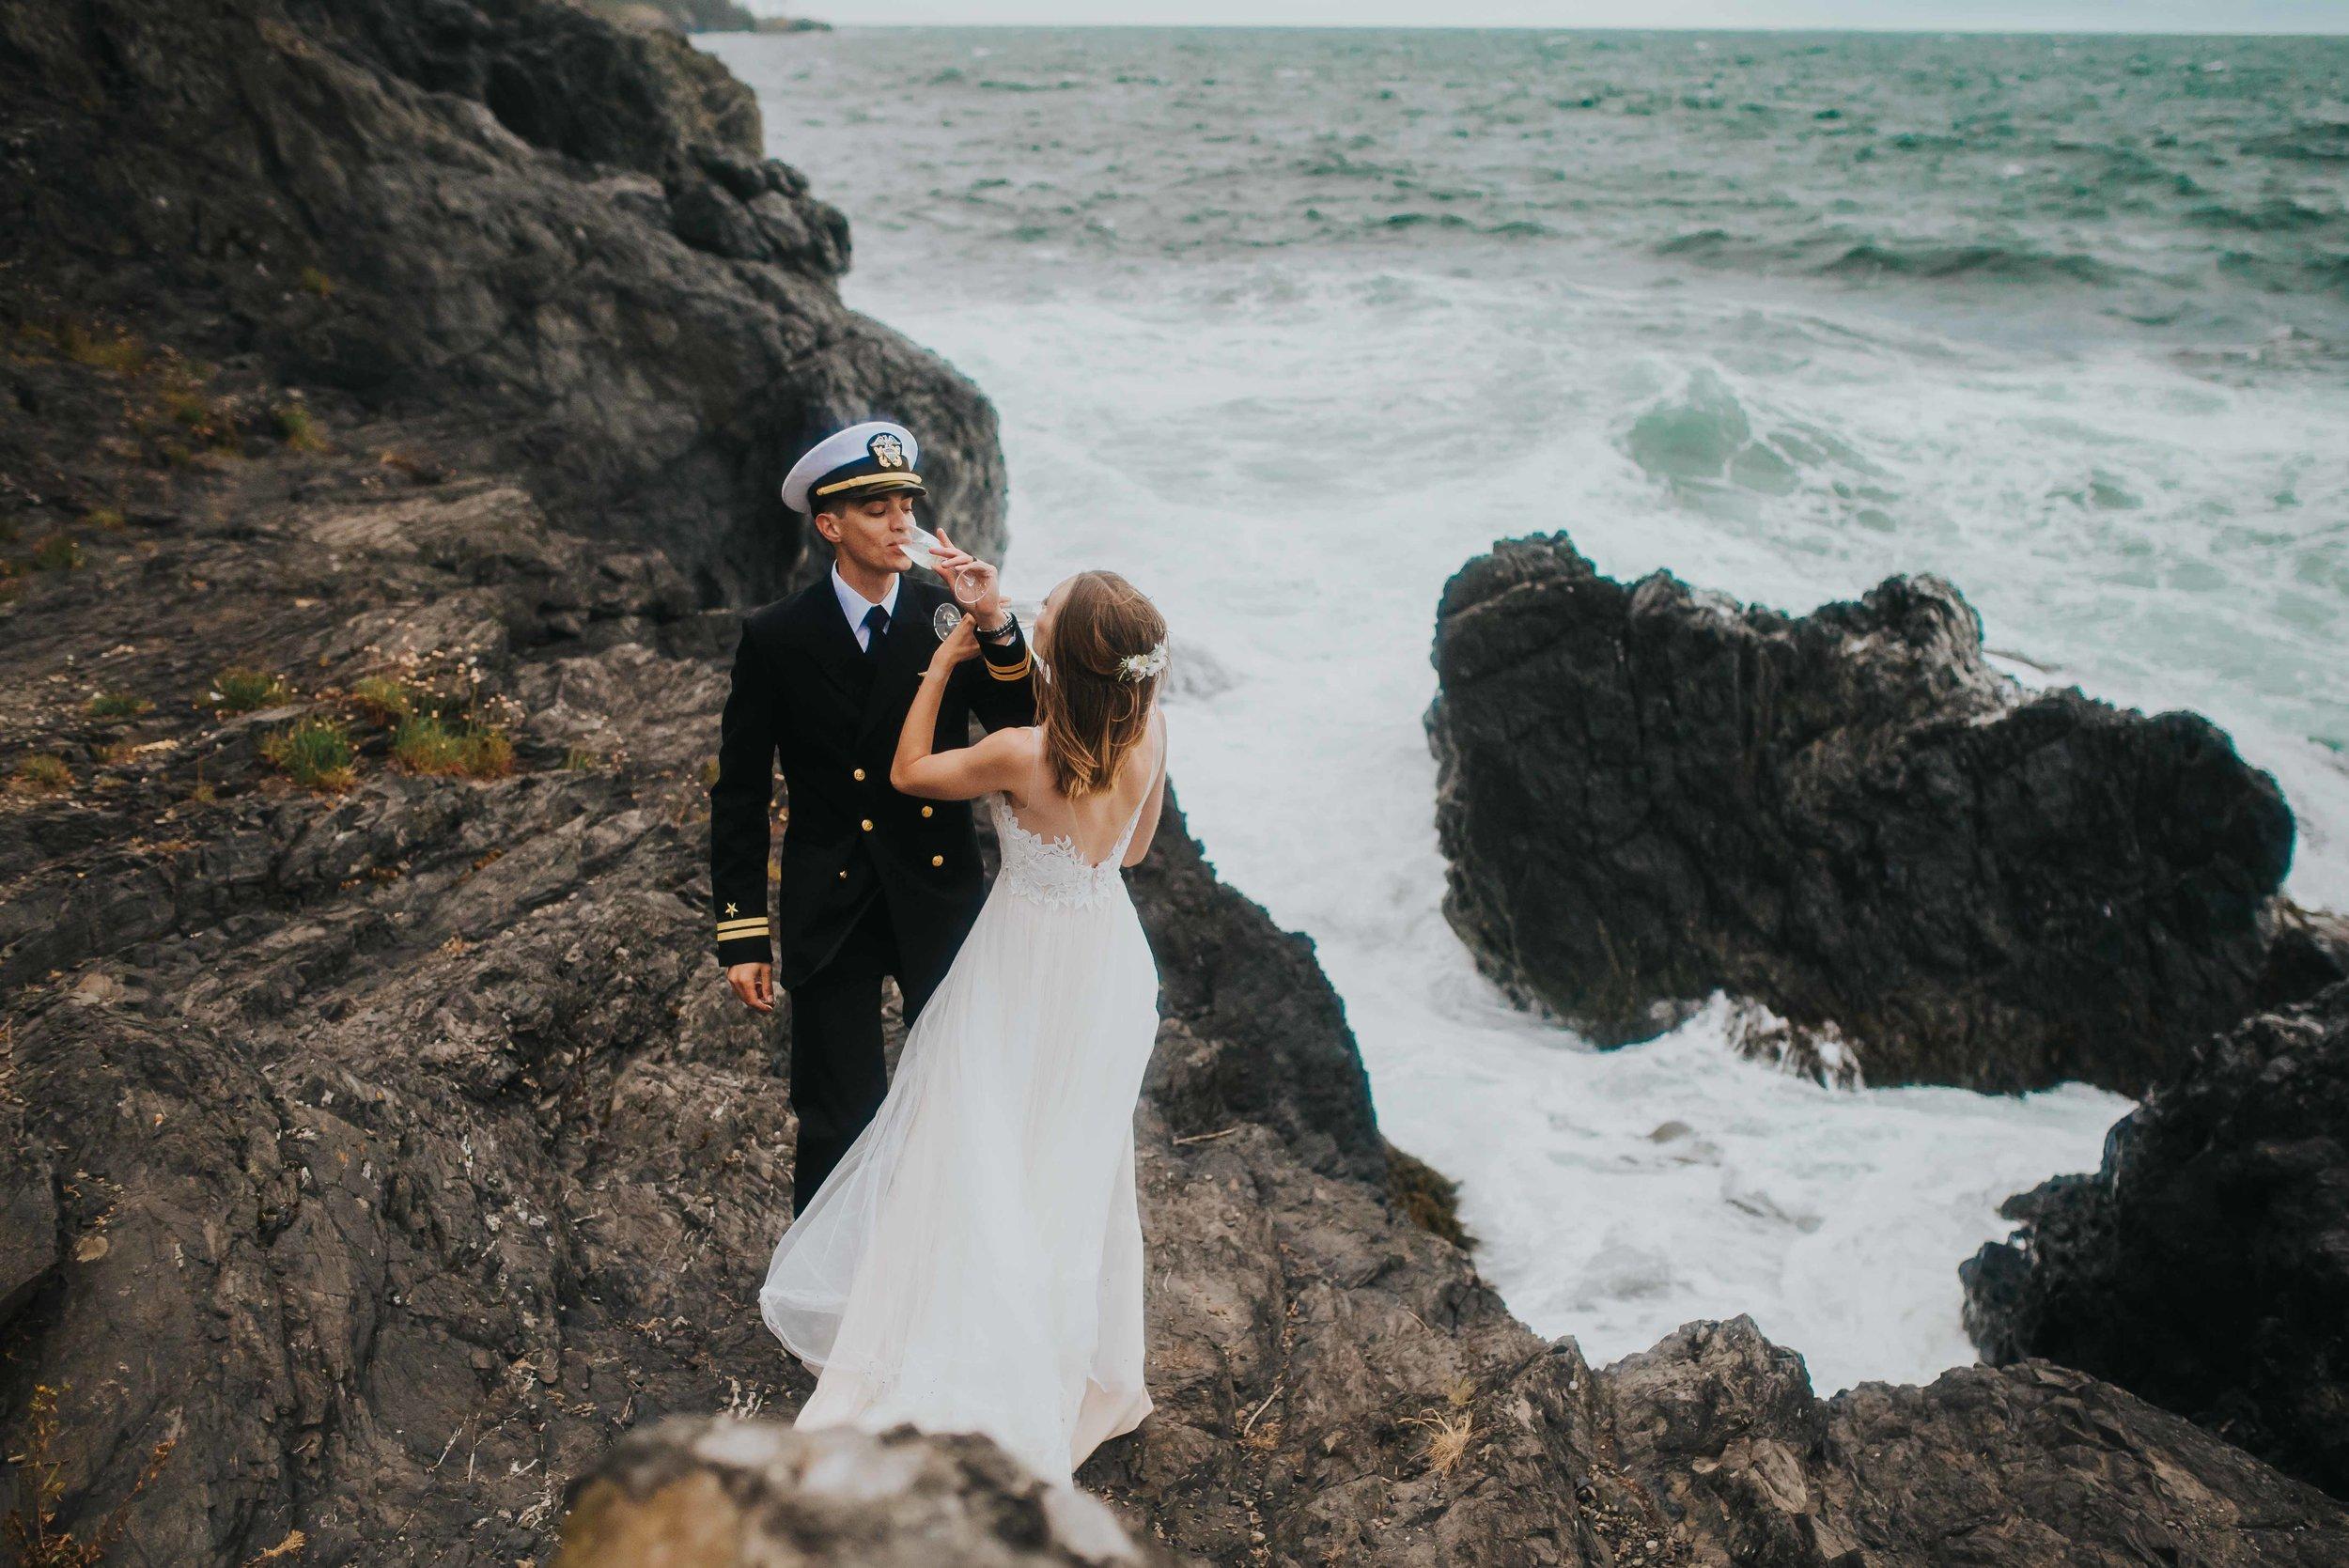 J-Hodges-Rosario-Wedding (9 of 15).jpg